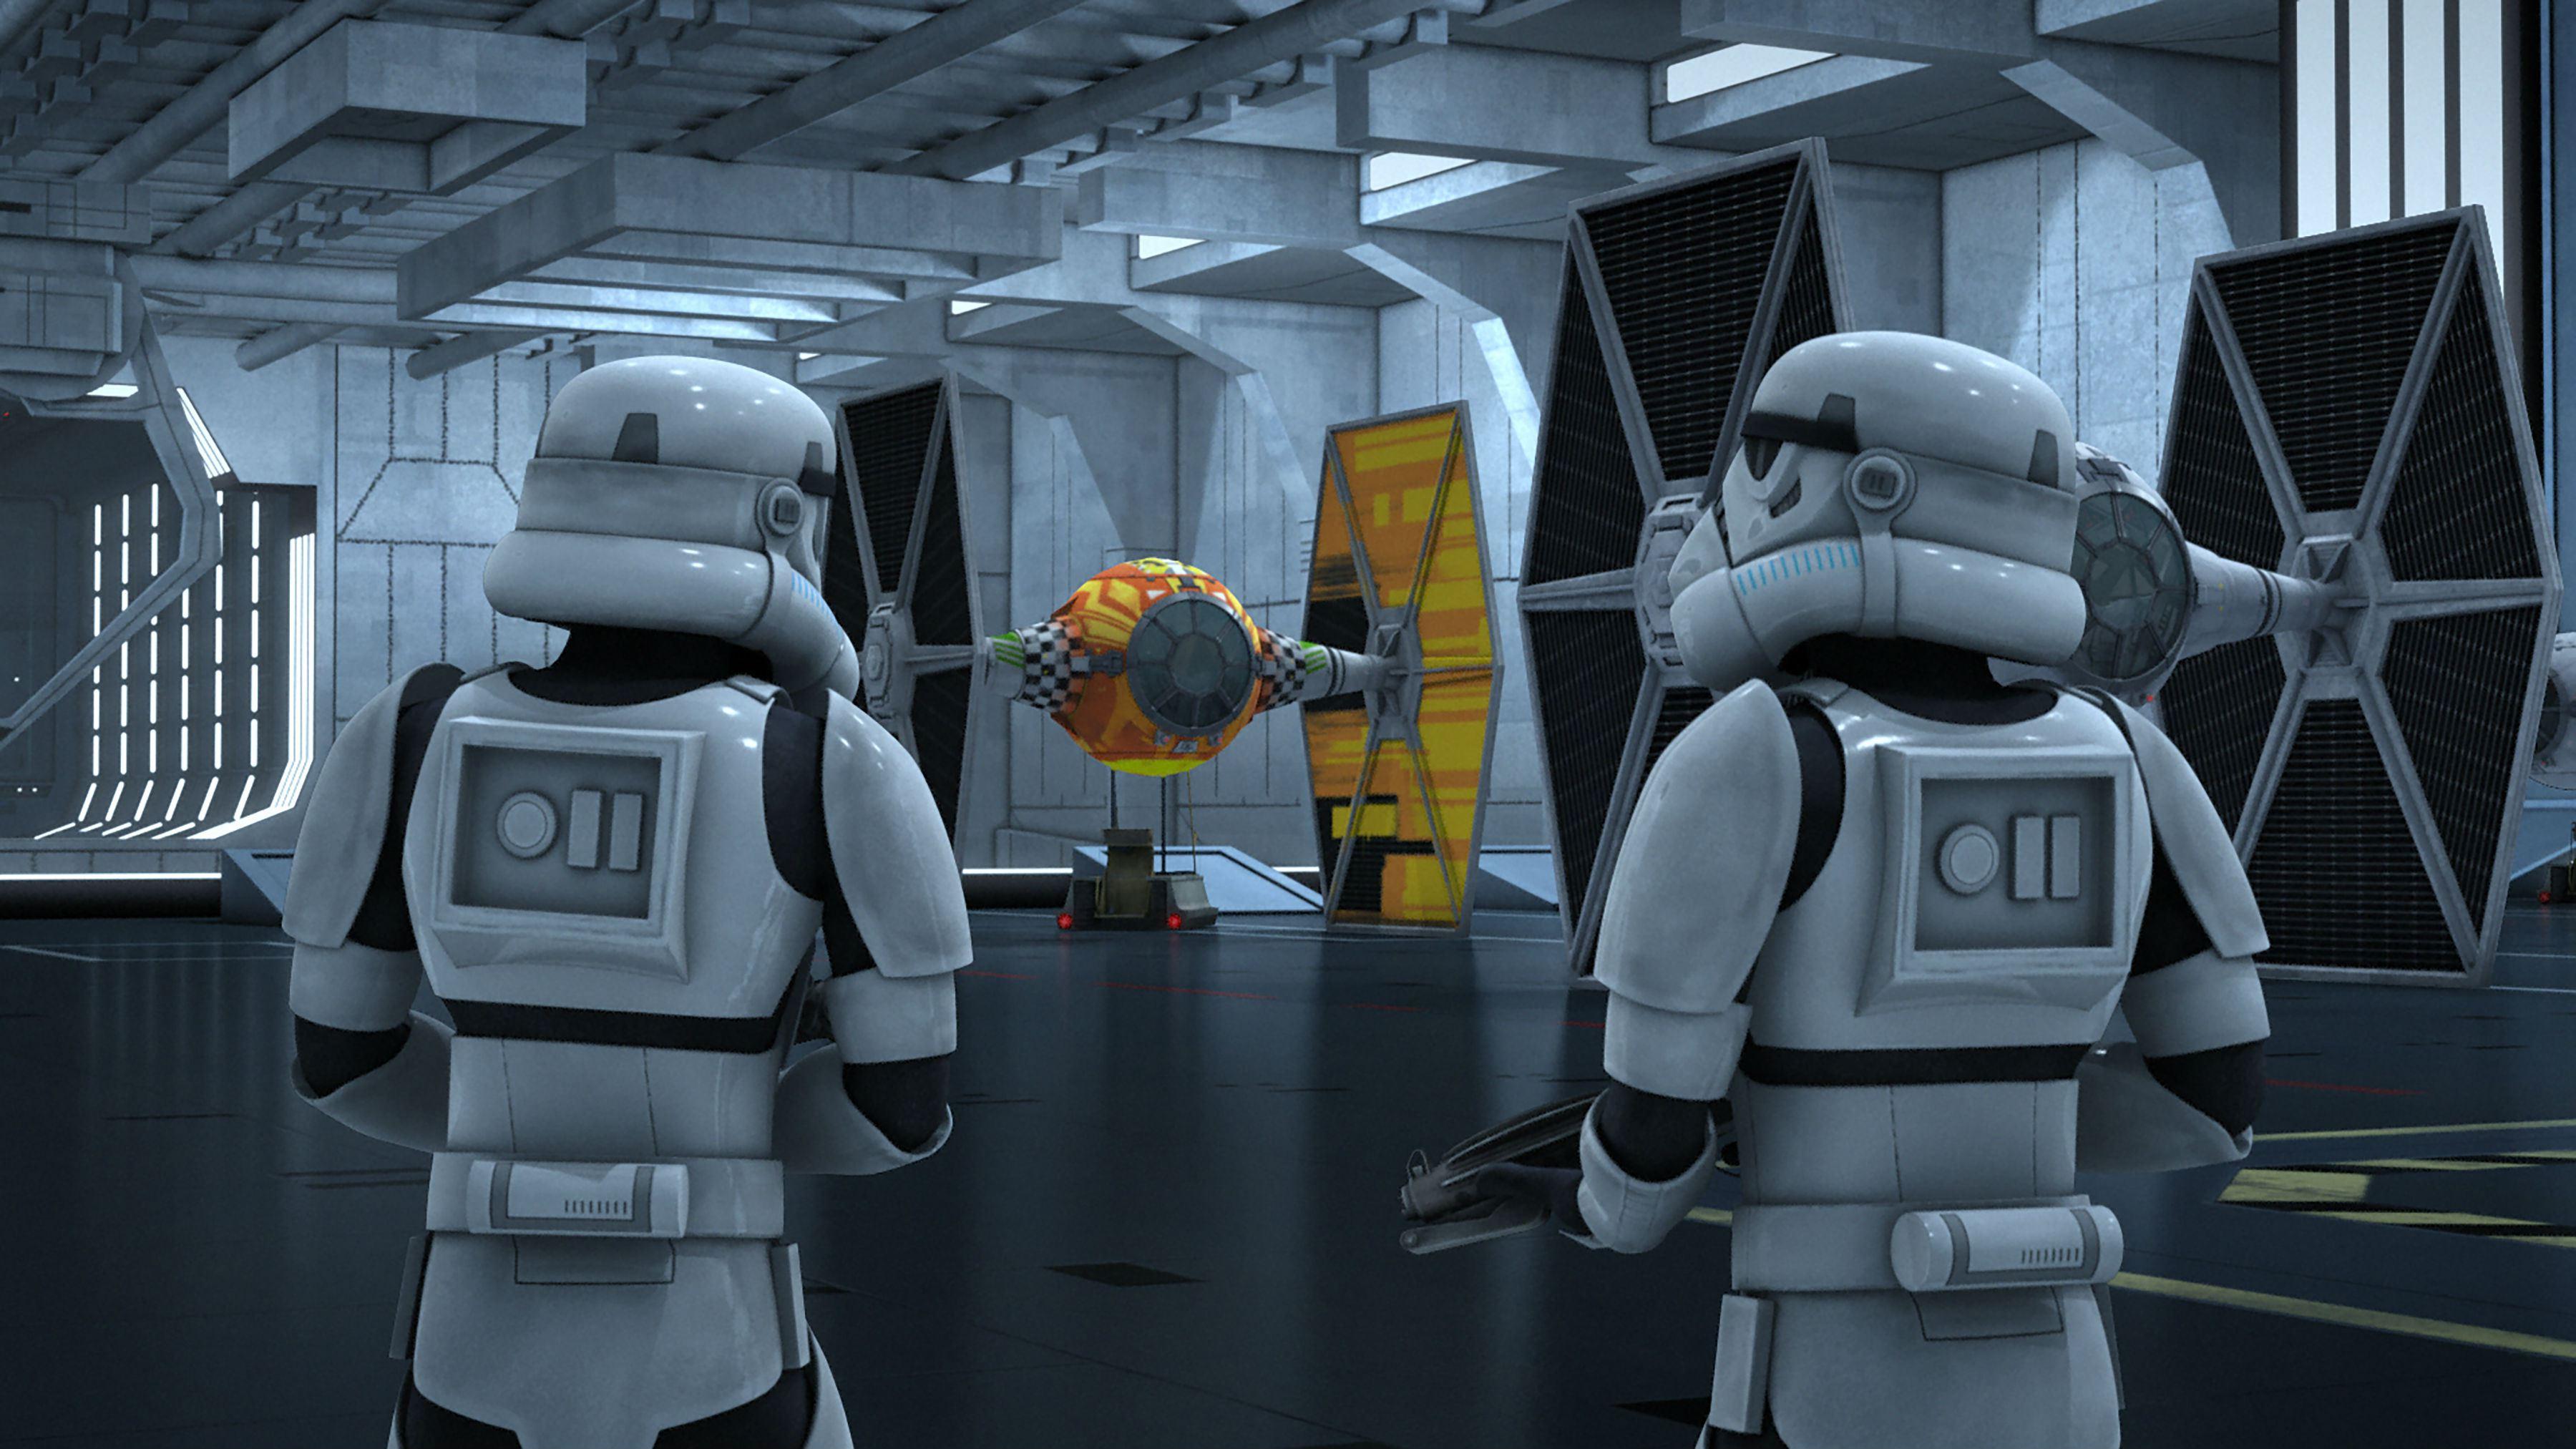 REVIEW: Star Wars Rebels: Complete Season One Blu-ray set ... - photo#42